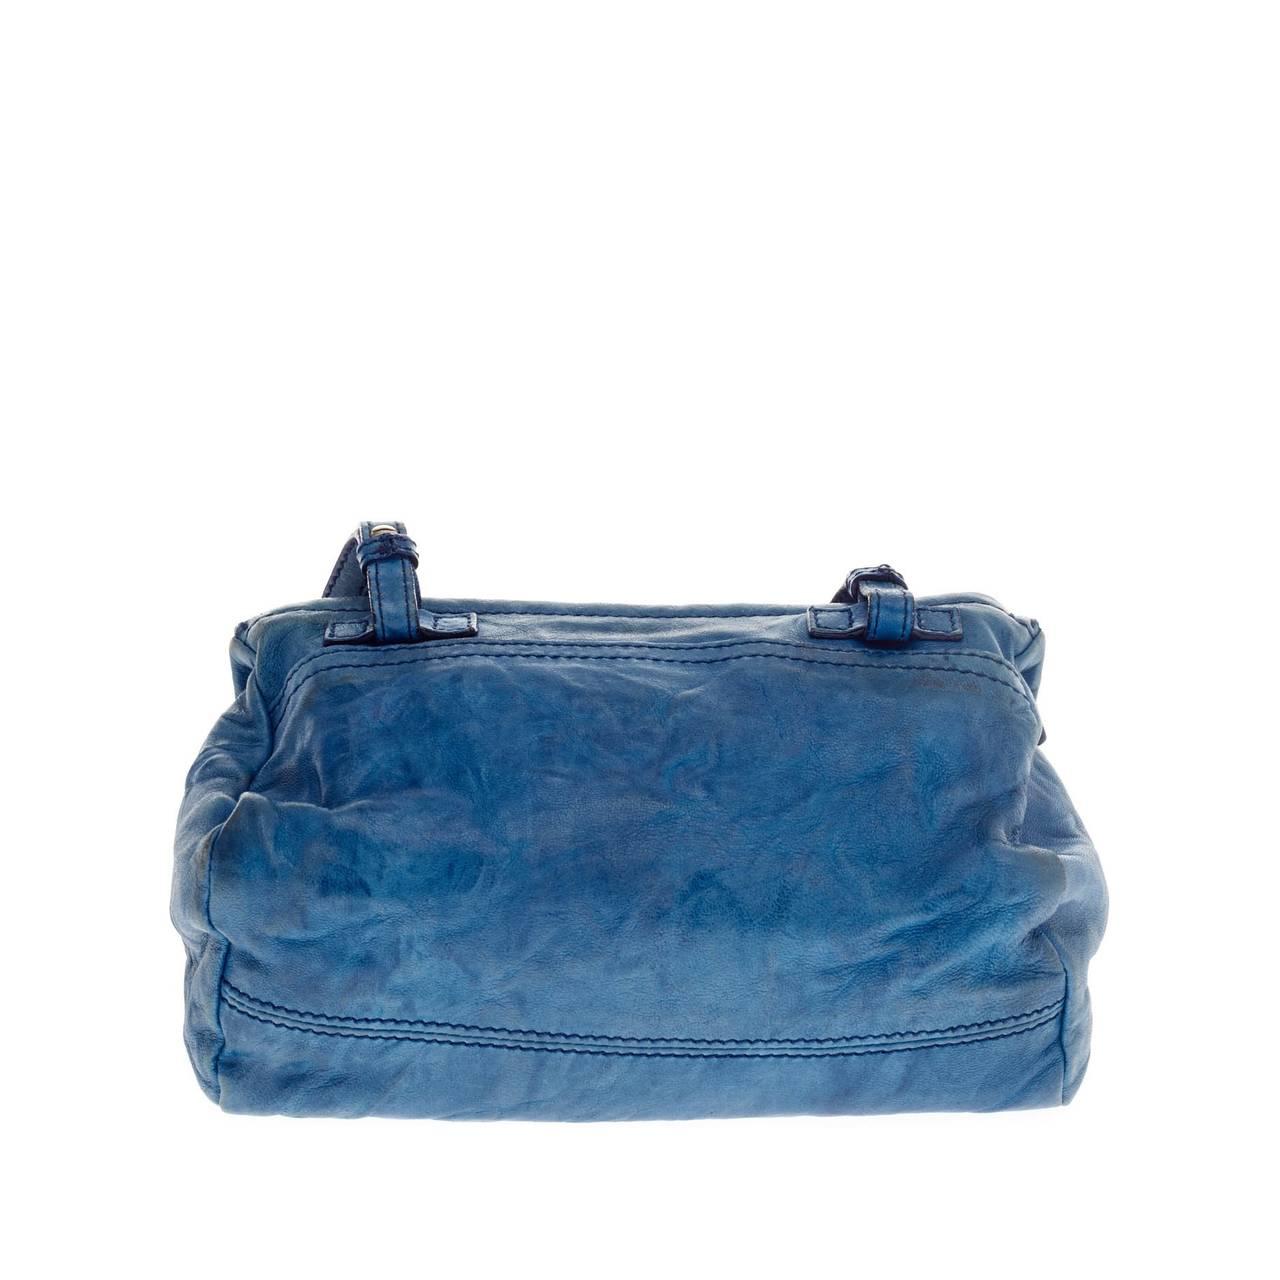 Givenchy Pandora Bag Leather Mini 4